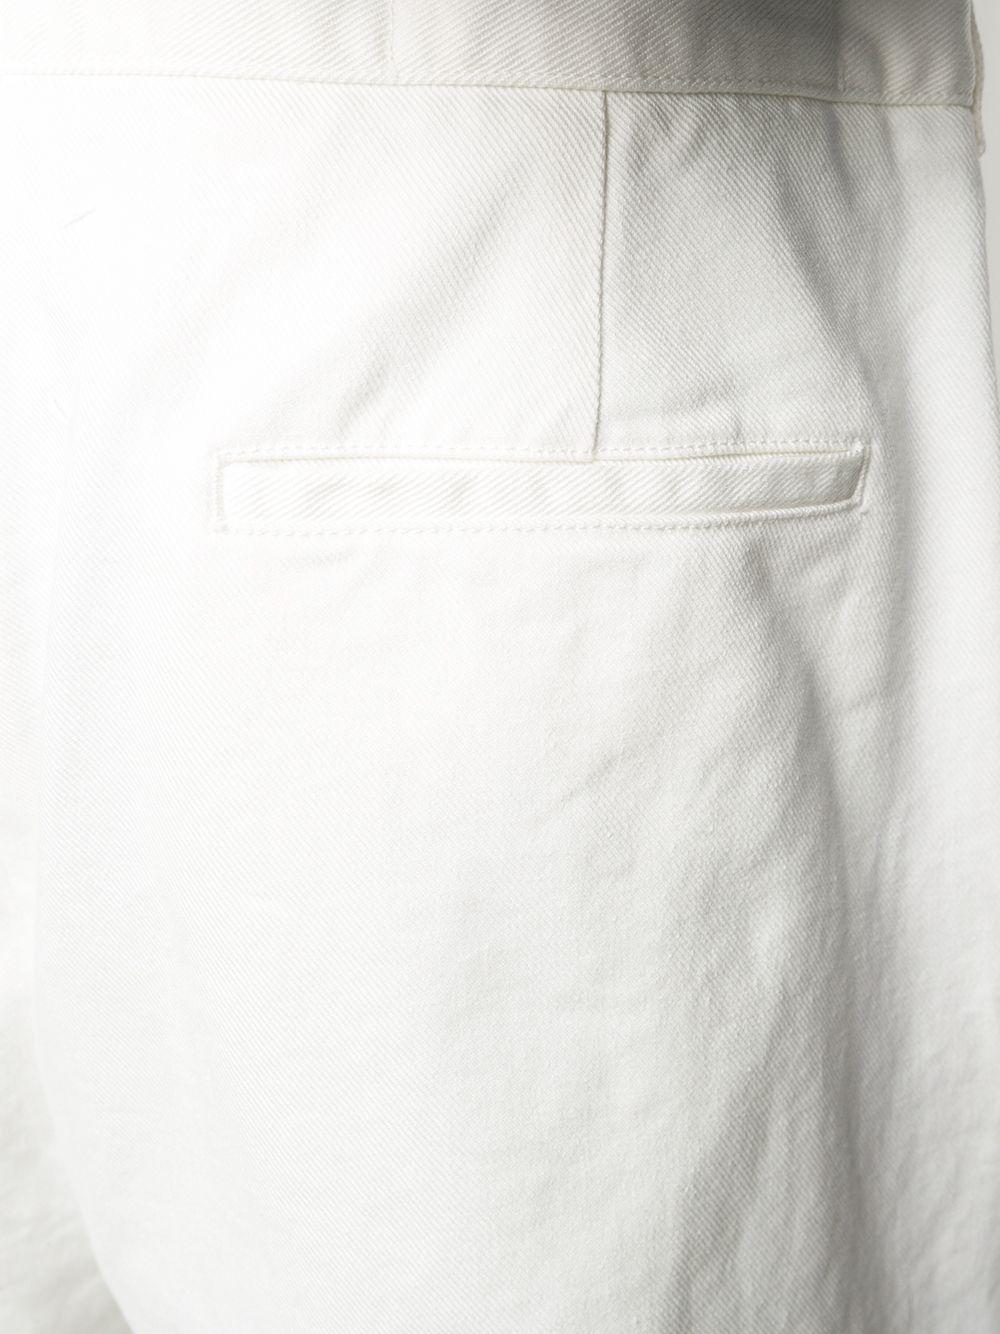 Maison Margiela | Maison Margiela джинсы свободного кроя | Clouty